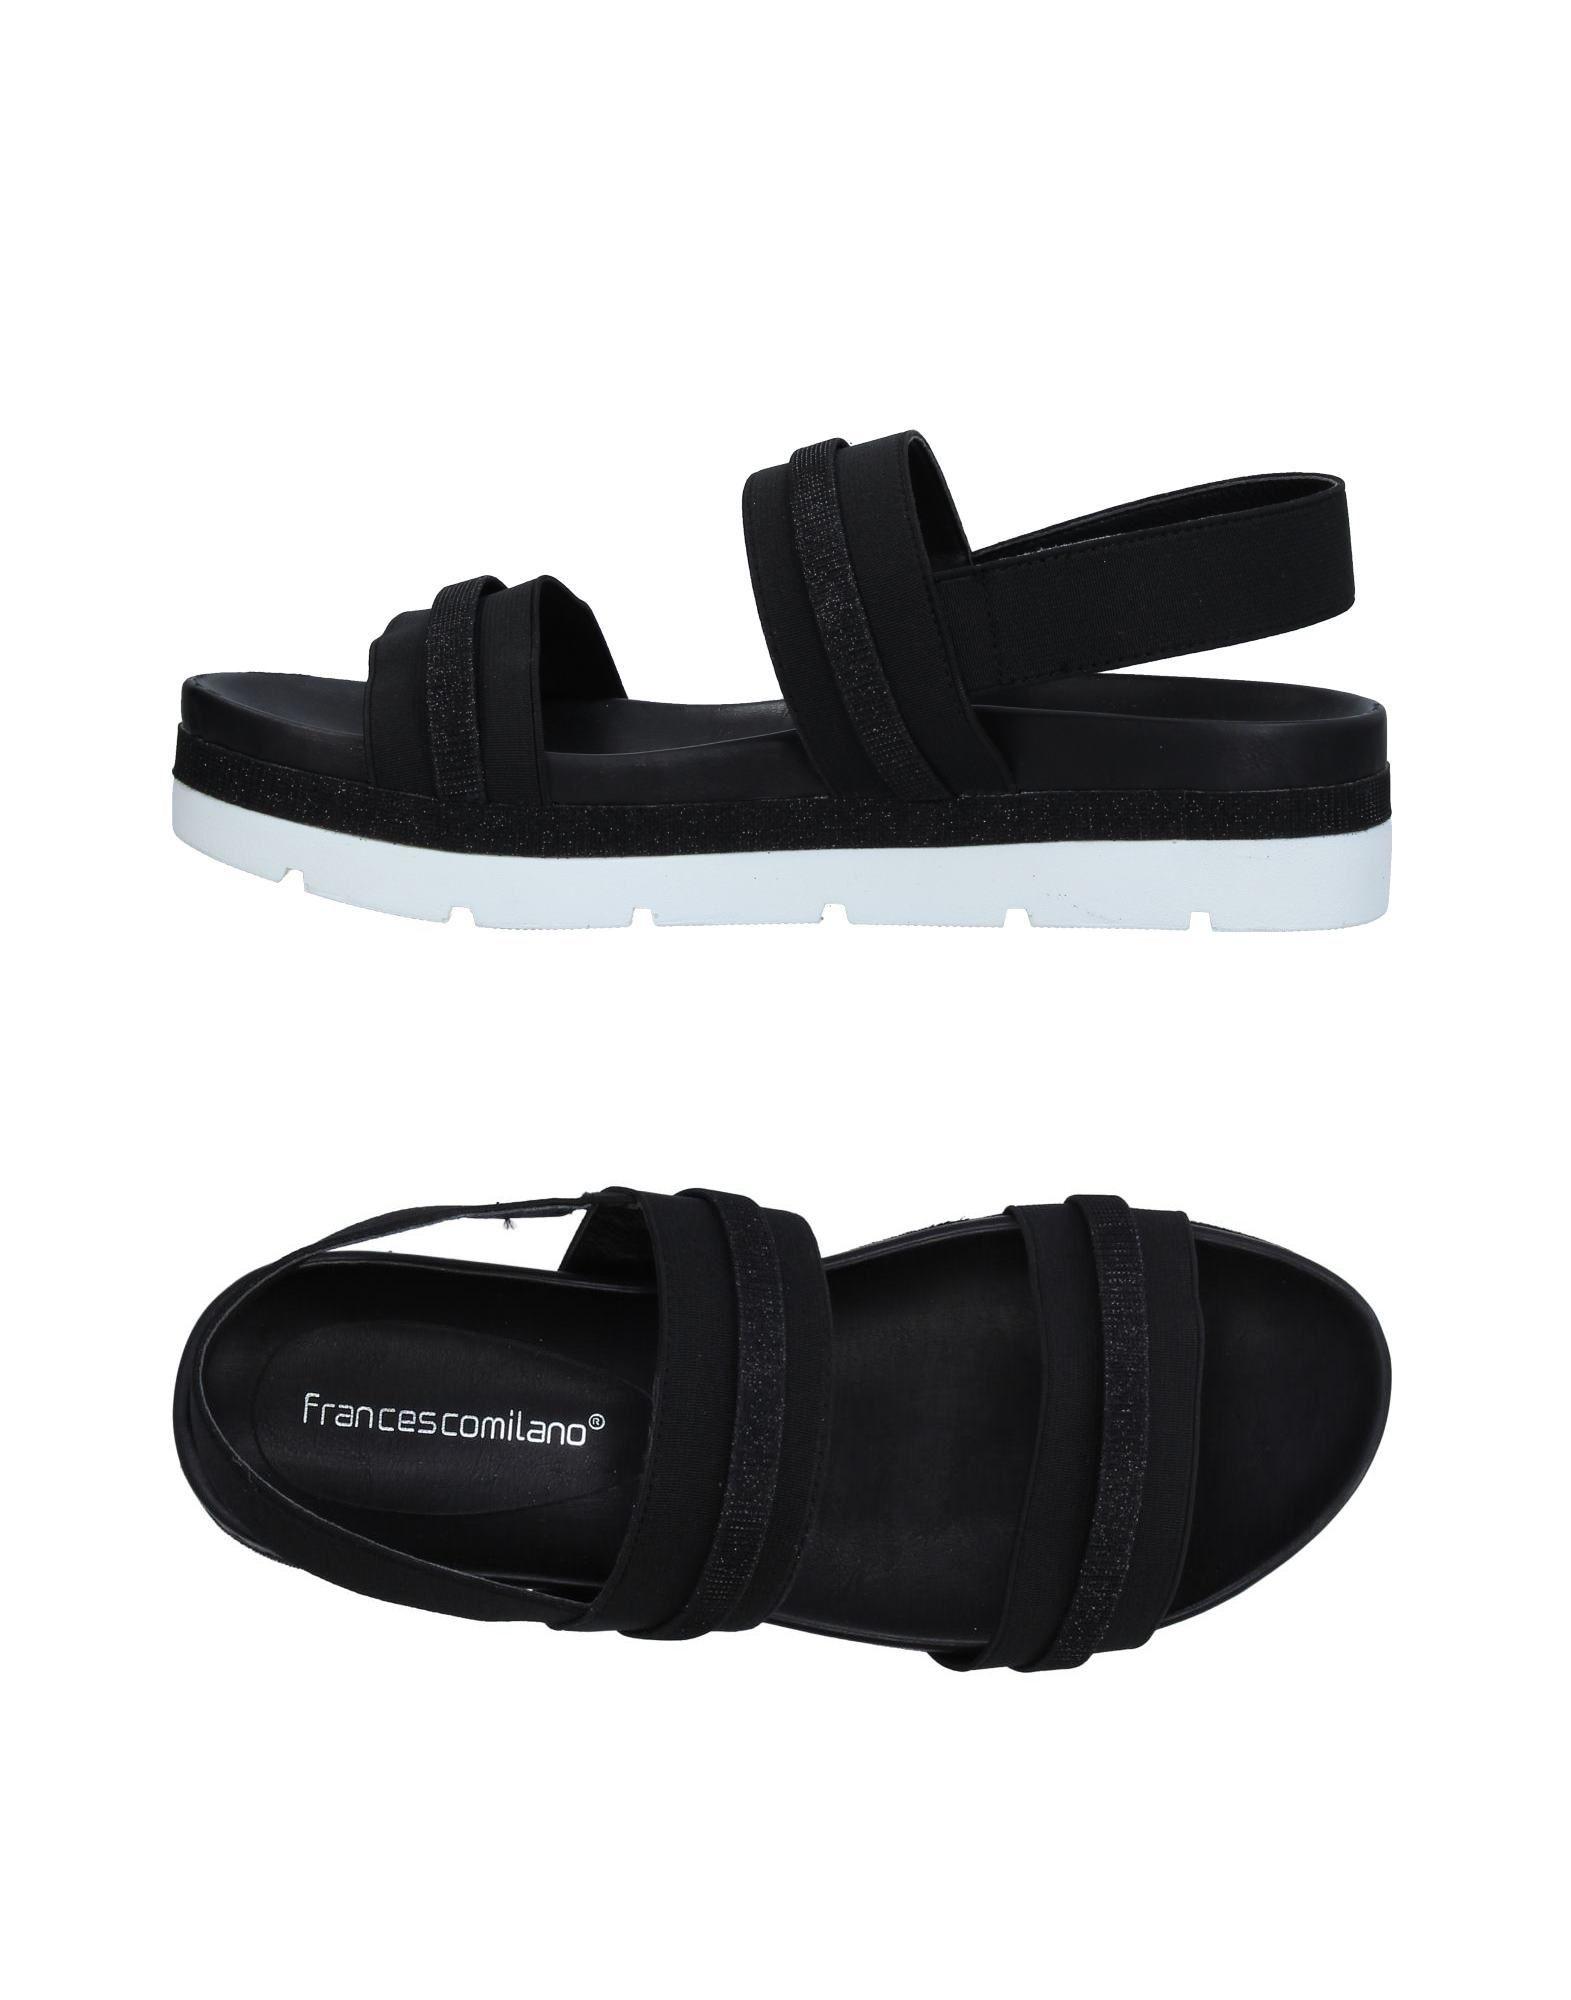 FOOTWEAR - Loafers Francesco Milano Discount Visit New bpsn3VIsI